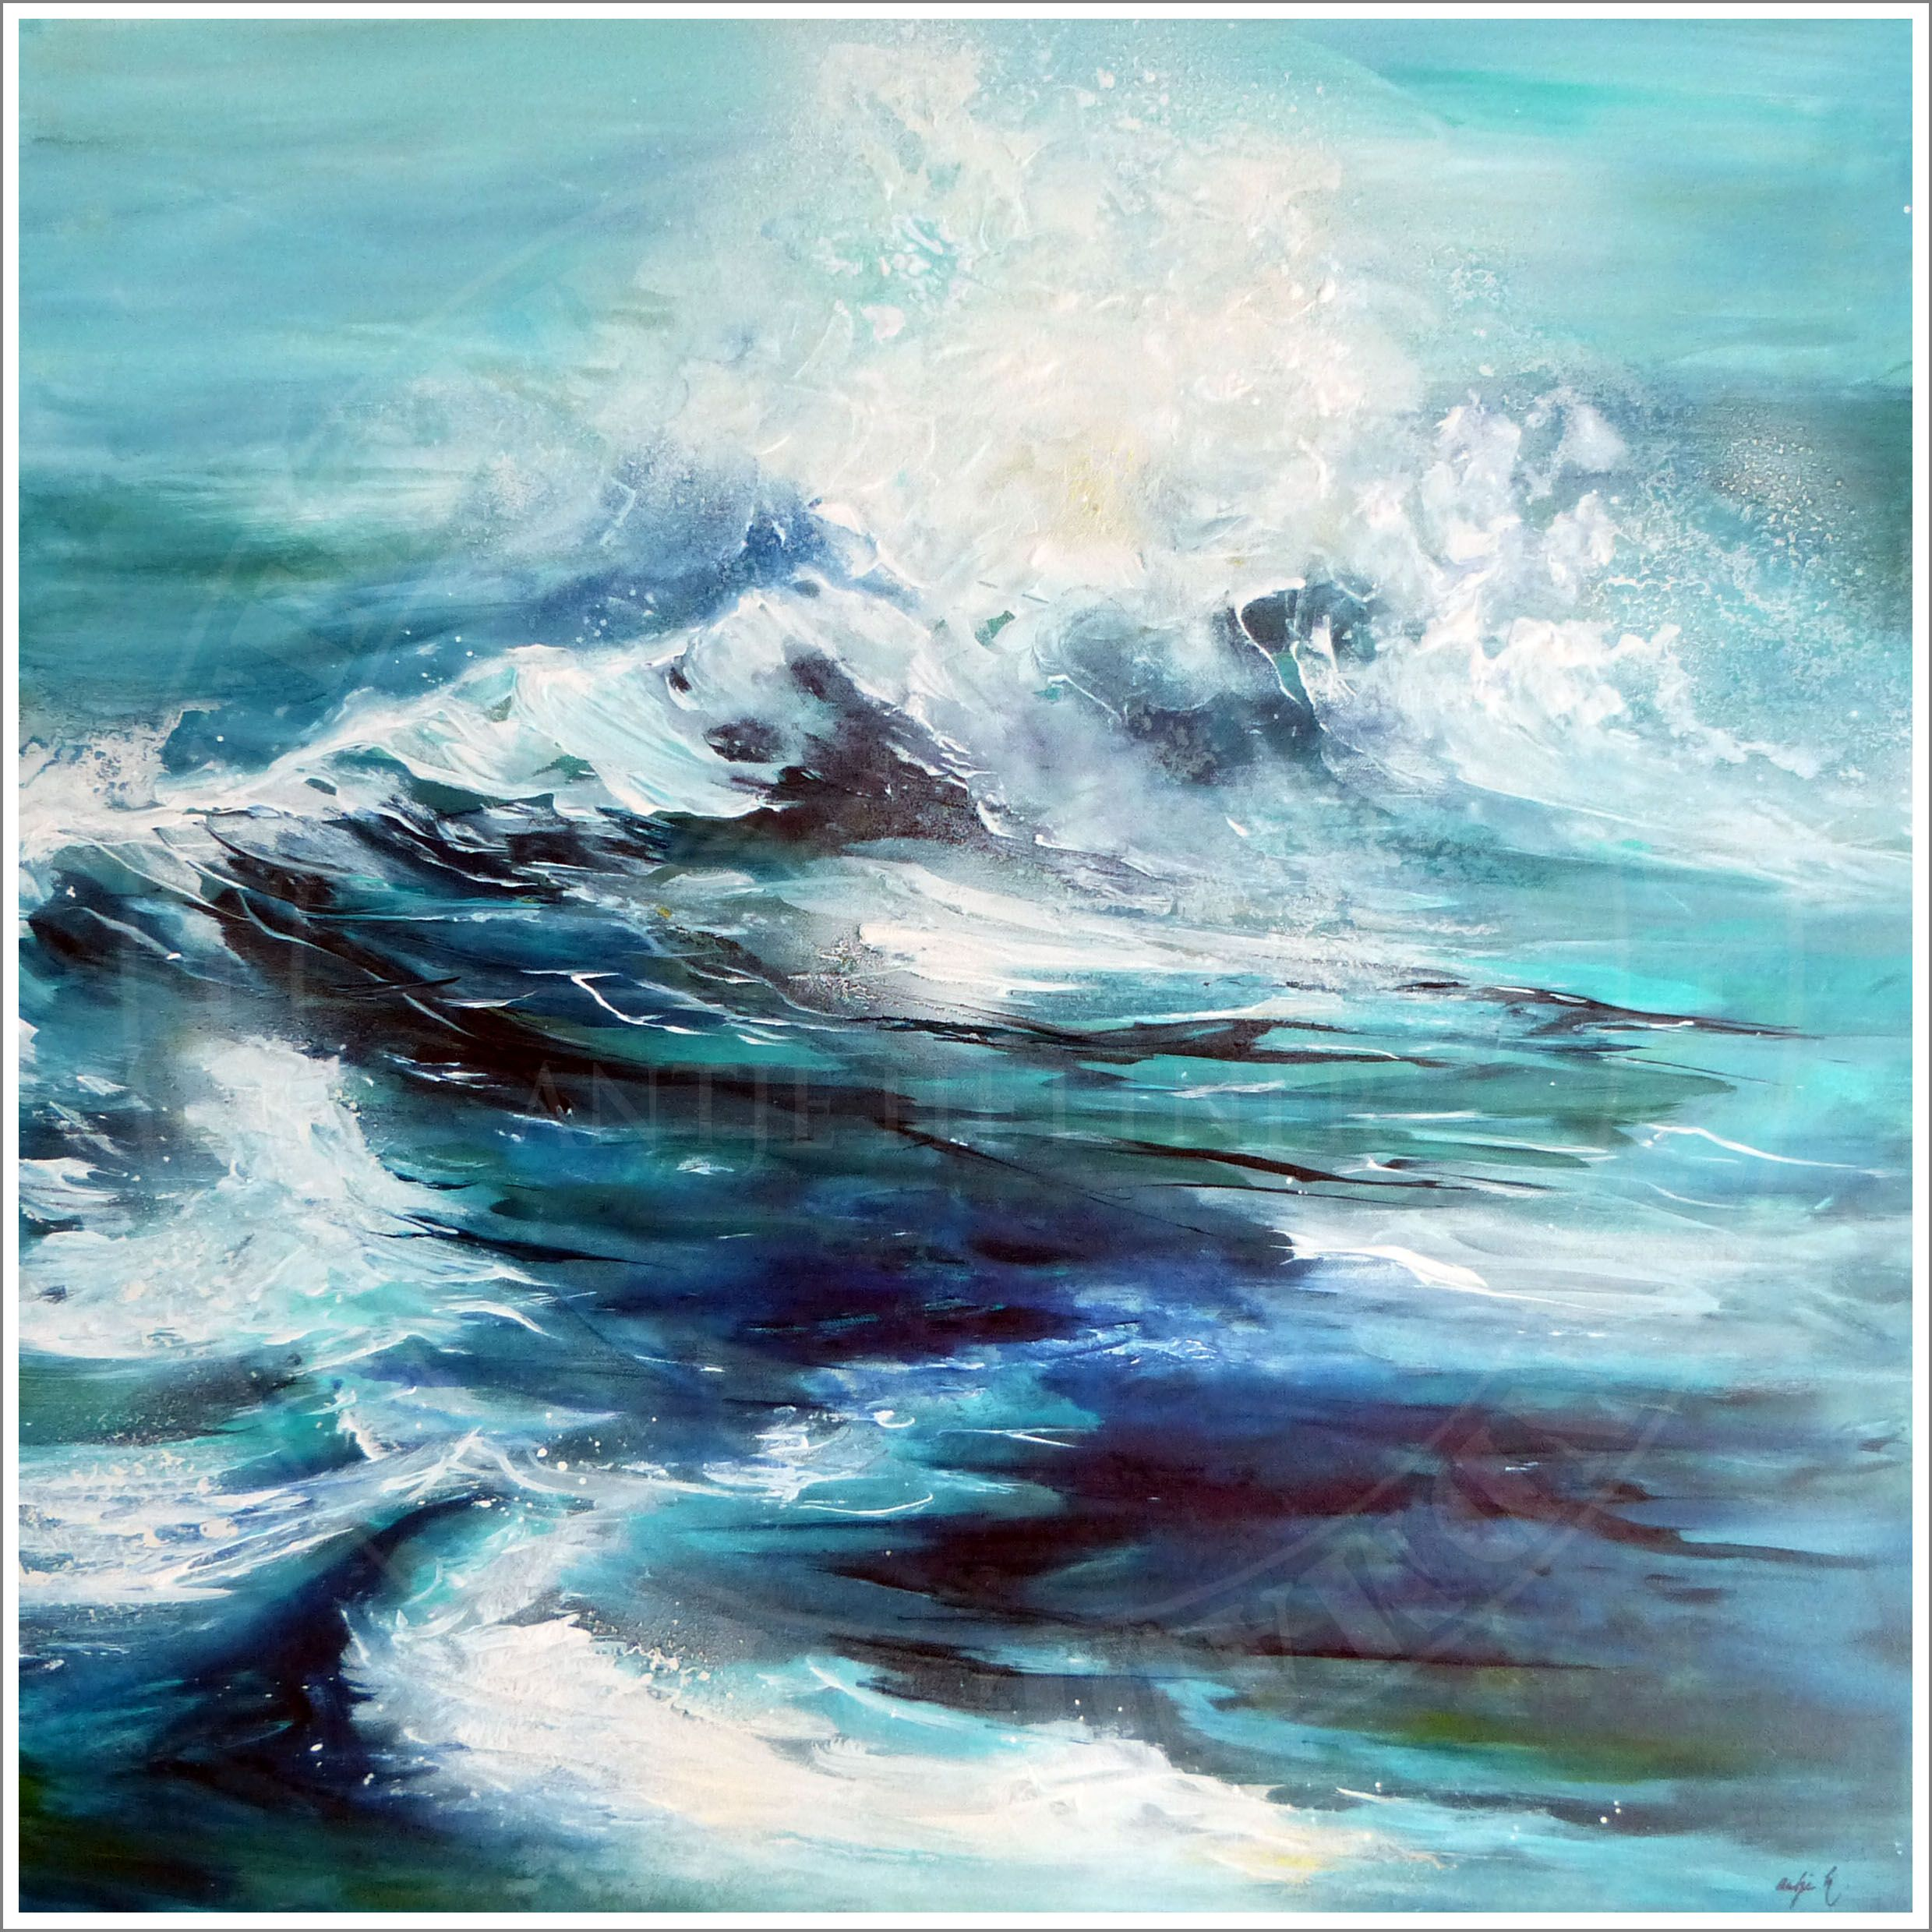 Pin Von Kay Auf Abstract Paintings Aquarelle Landschaften Meer